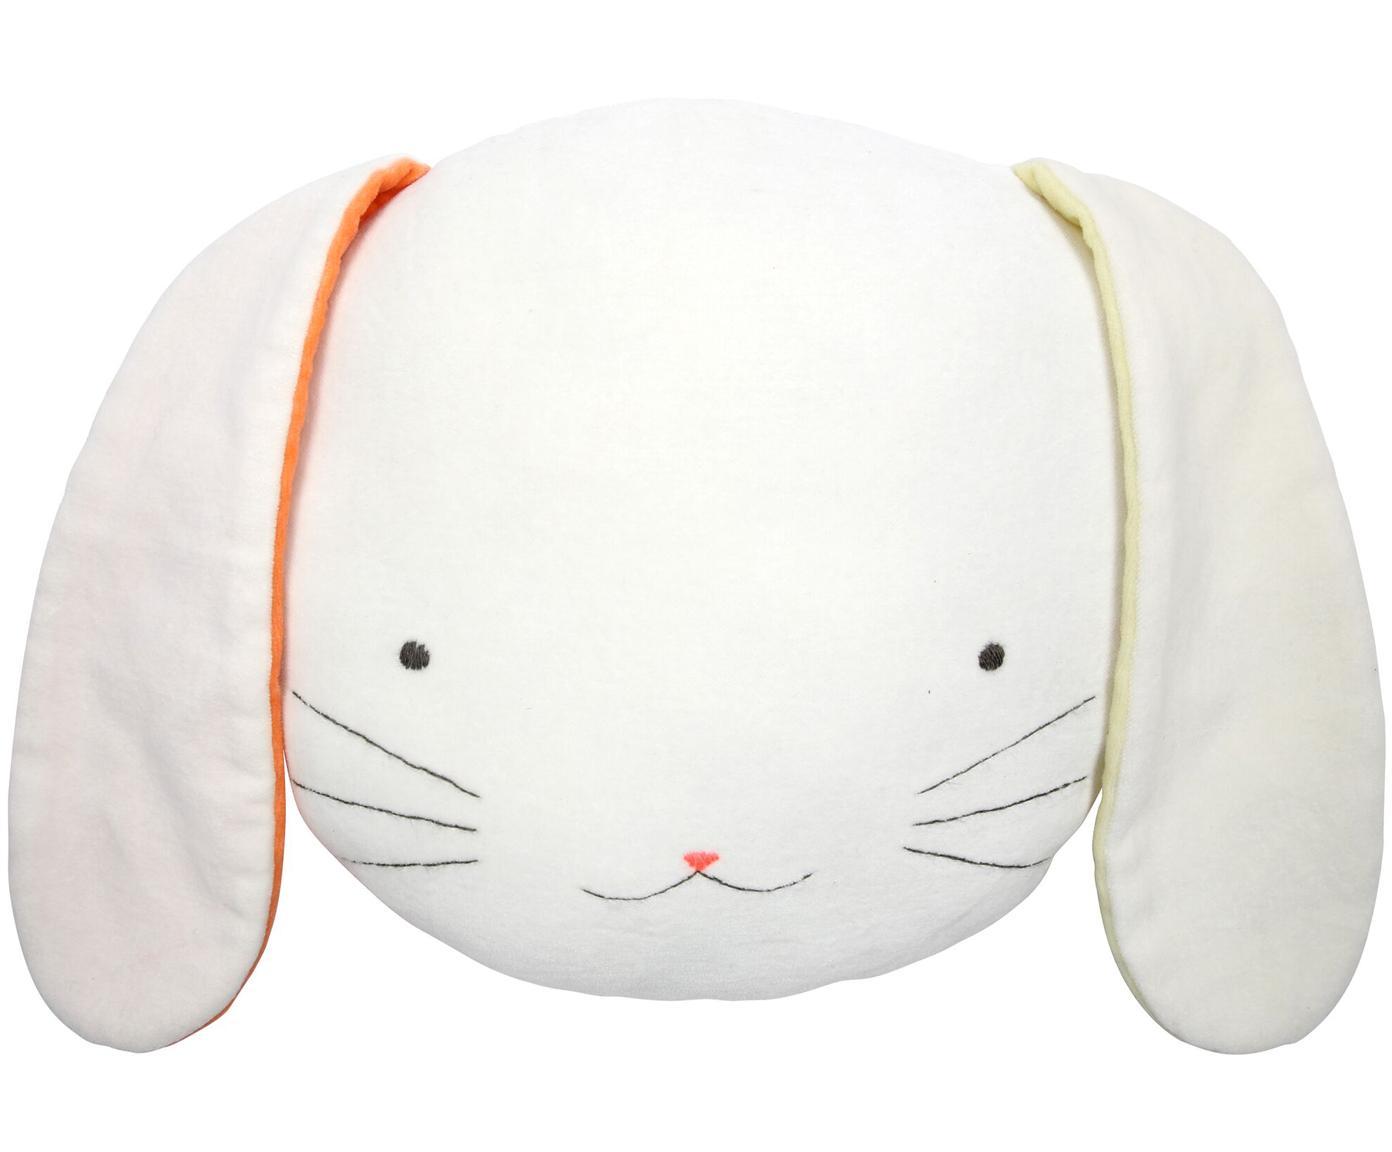 Knuffelkussen Bunny, Wit, geel, oranje, zwart, 26 x 20 cm